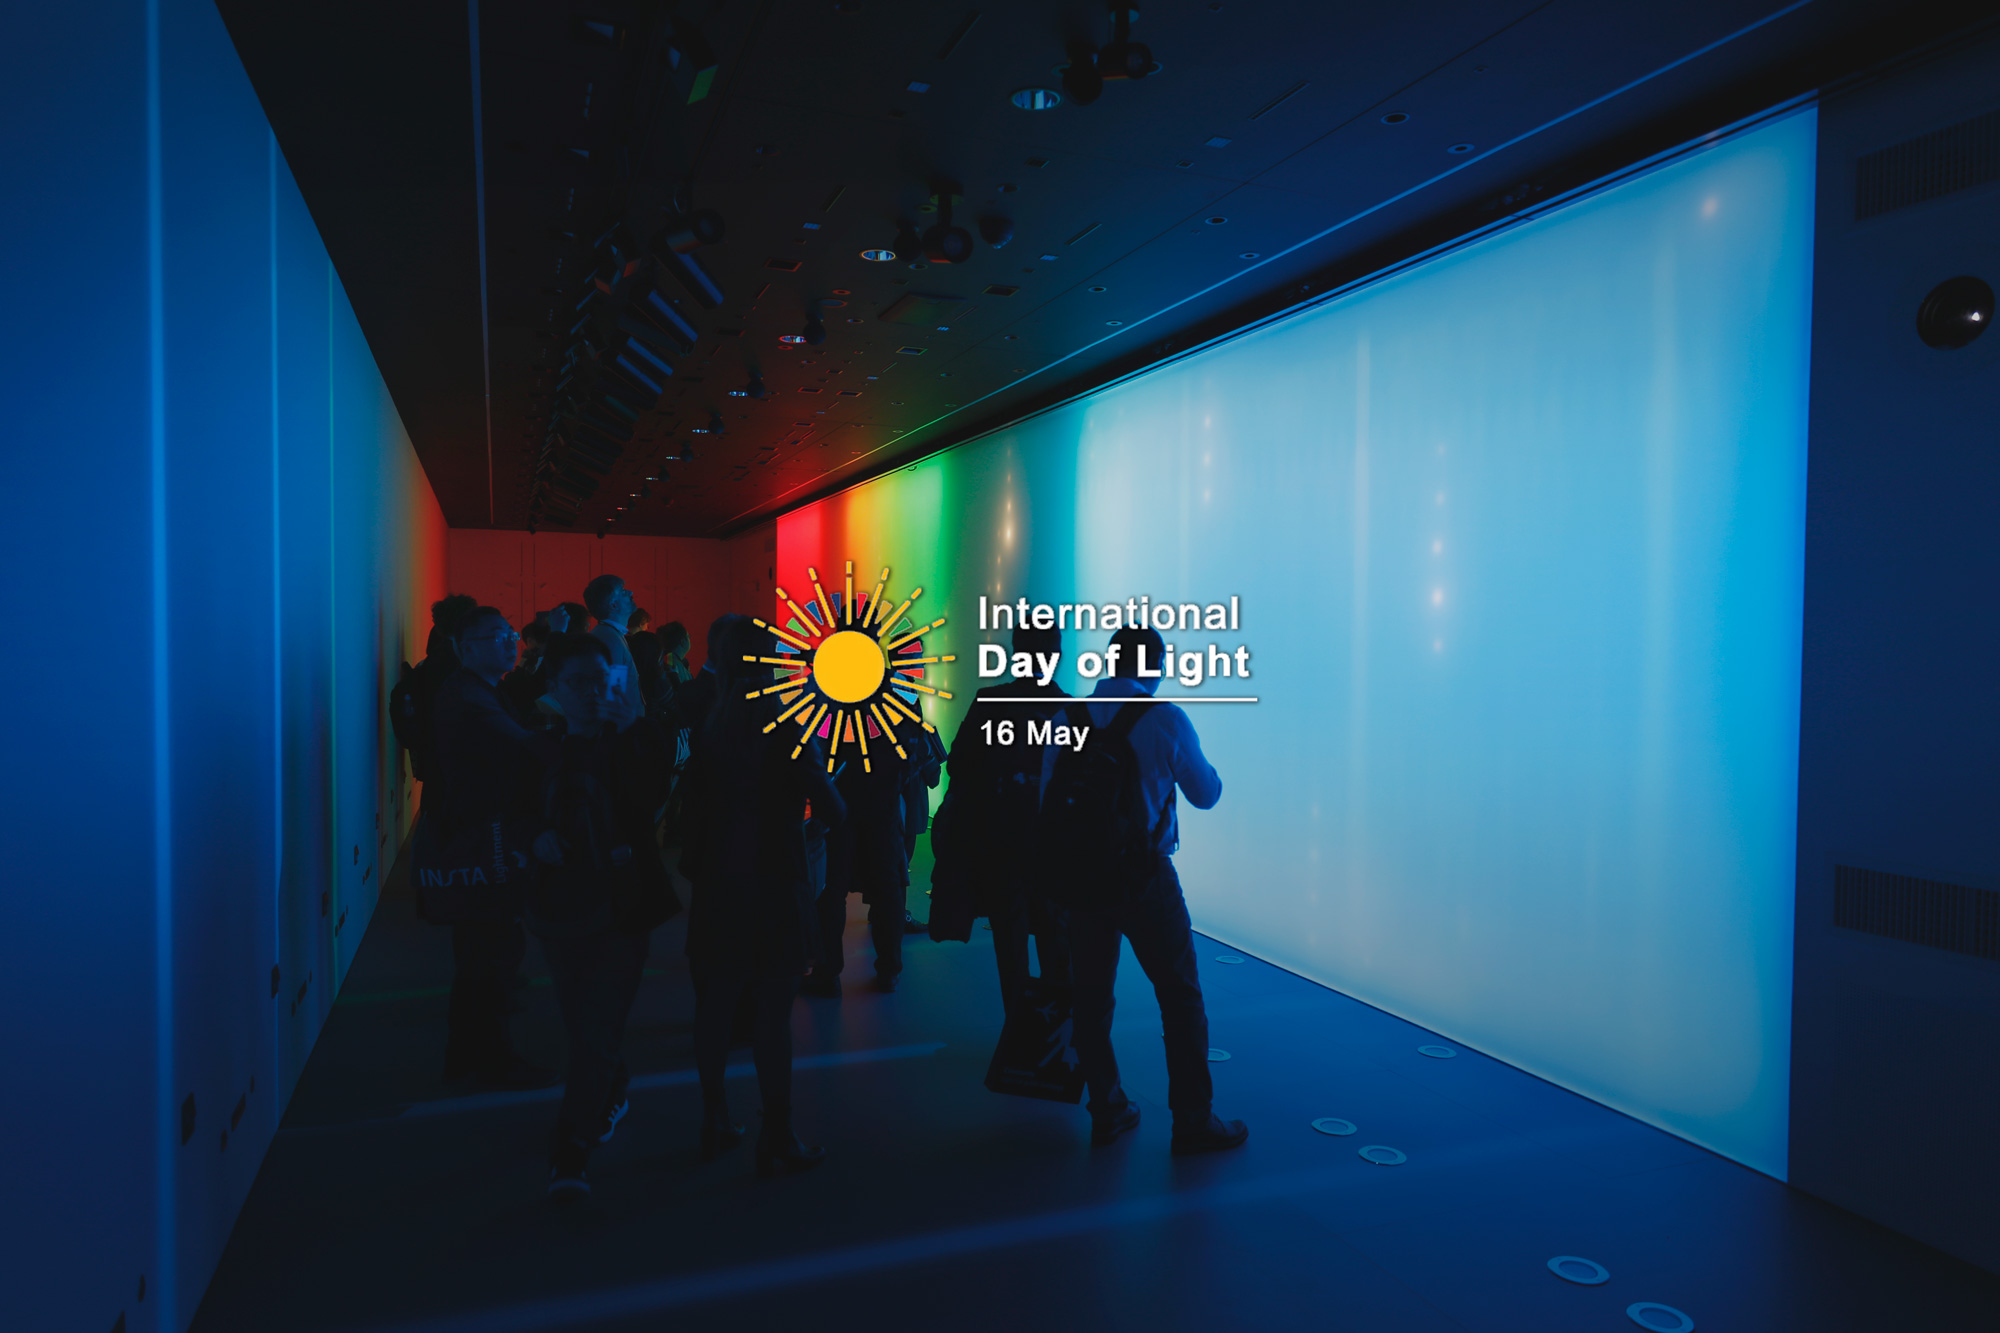 Jornada Internacional de la Luz